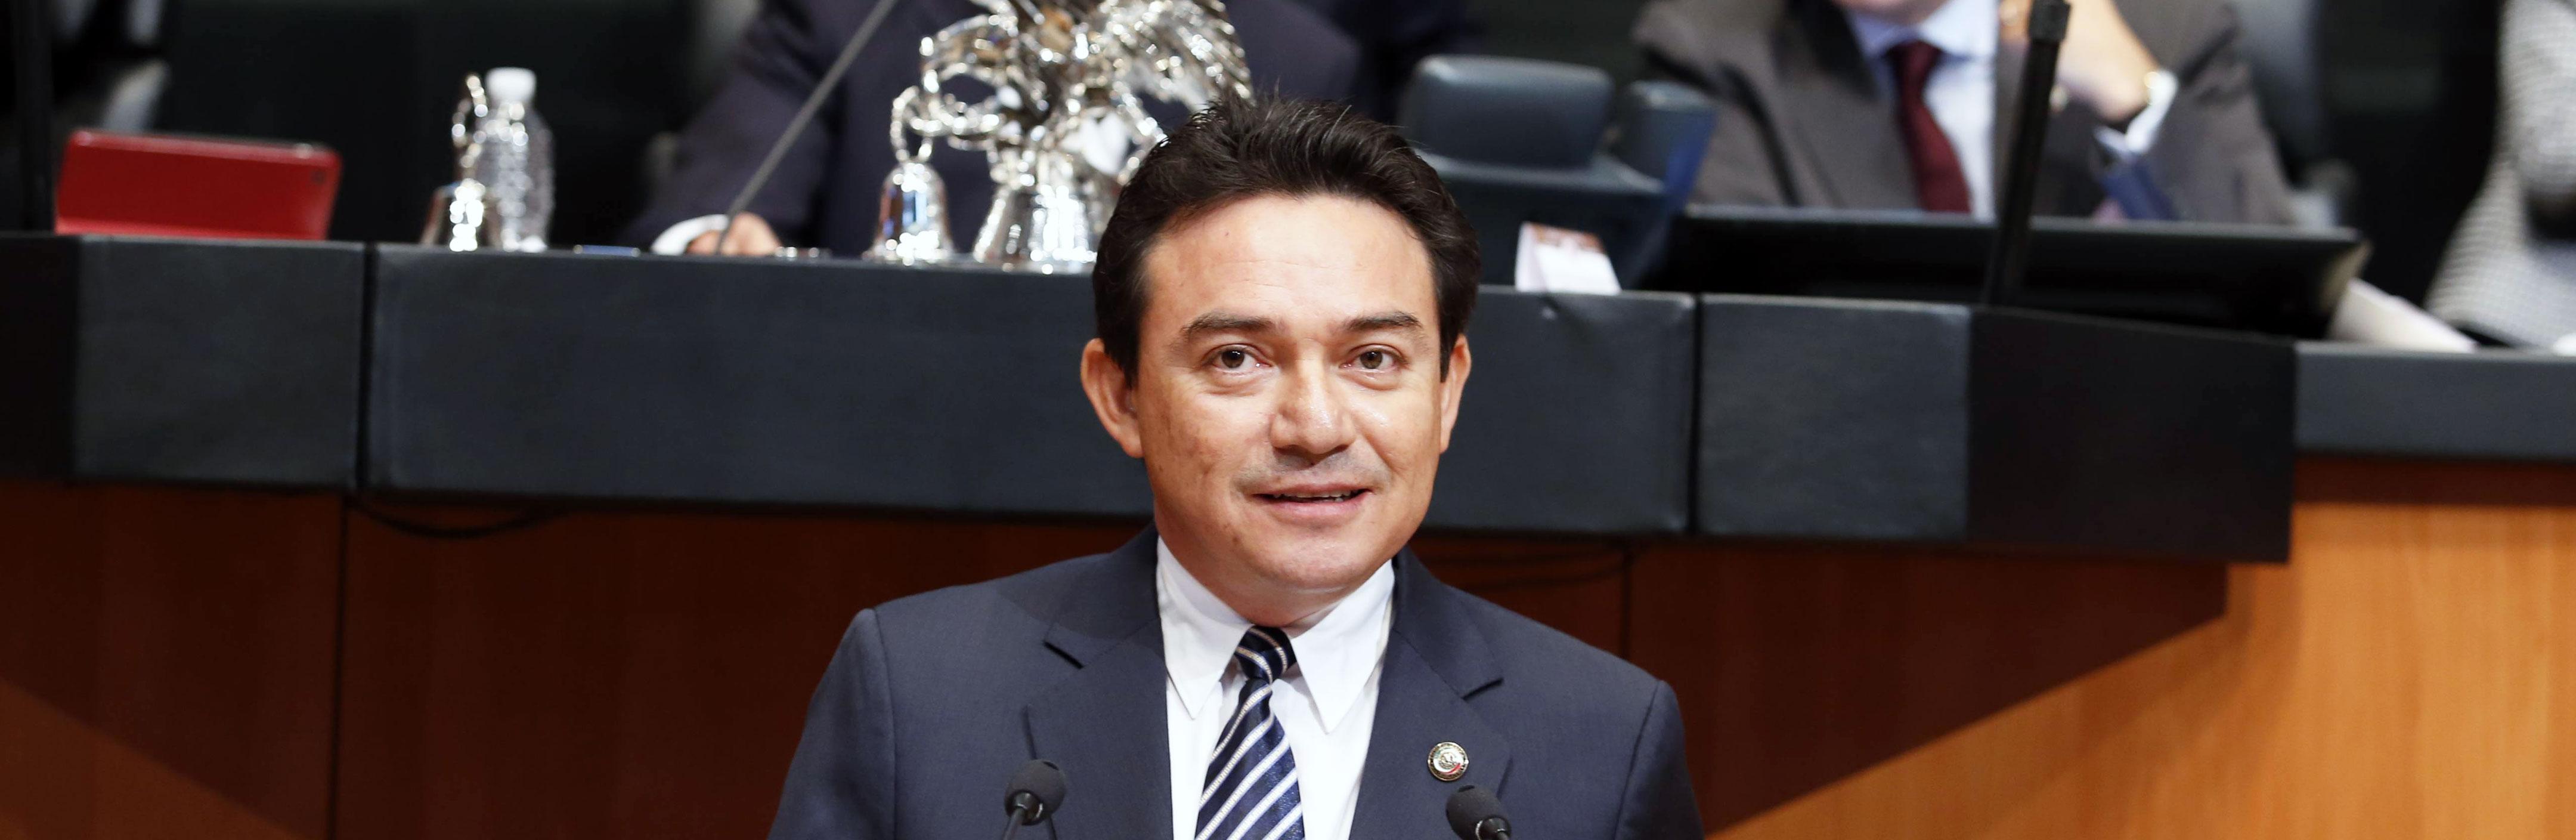 Daniel Ávila Ruiz - Soy tu voz en el Senado